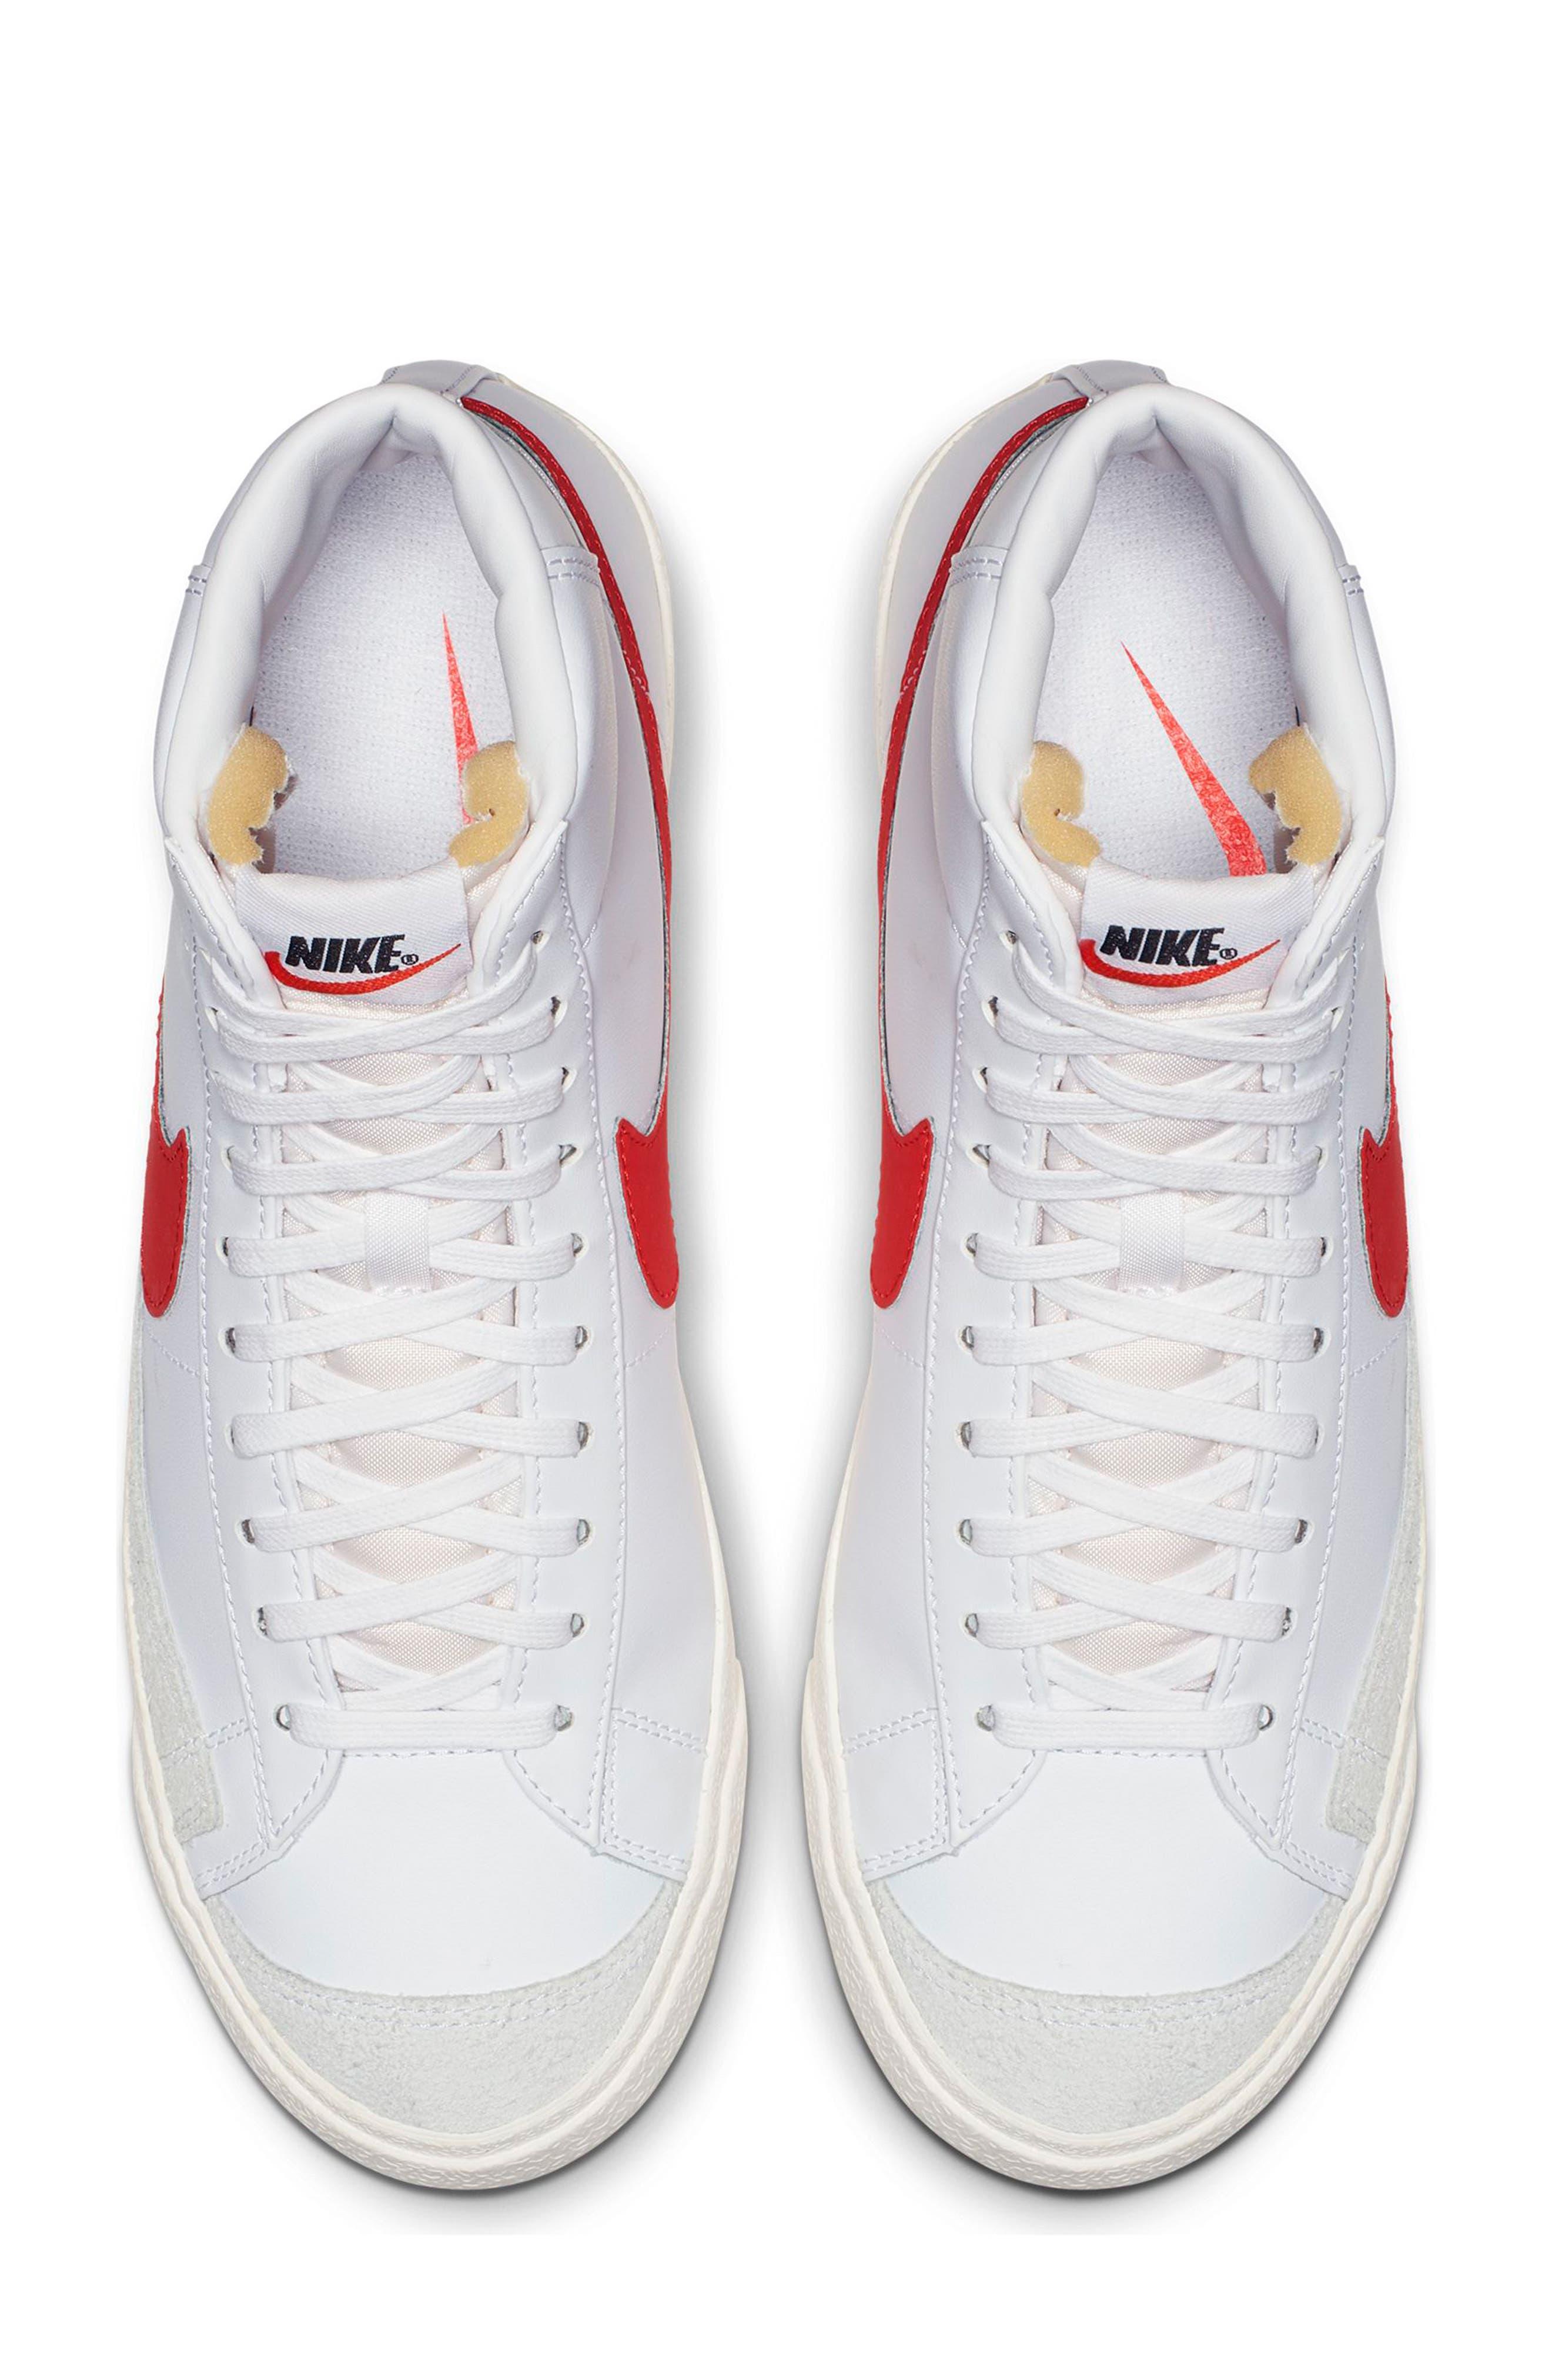 Blazer Mid '77 Vintage Sneaker,                             Alternate thumbnail 4, color,                             HABANERO RED/ SAIL/ WHITE